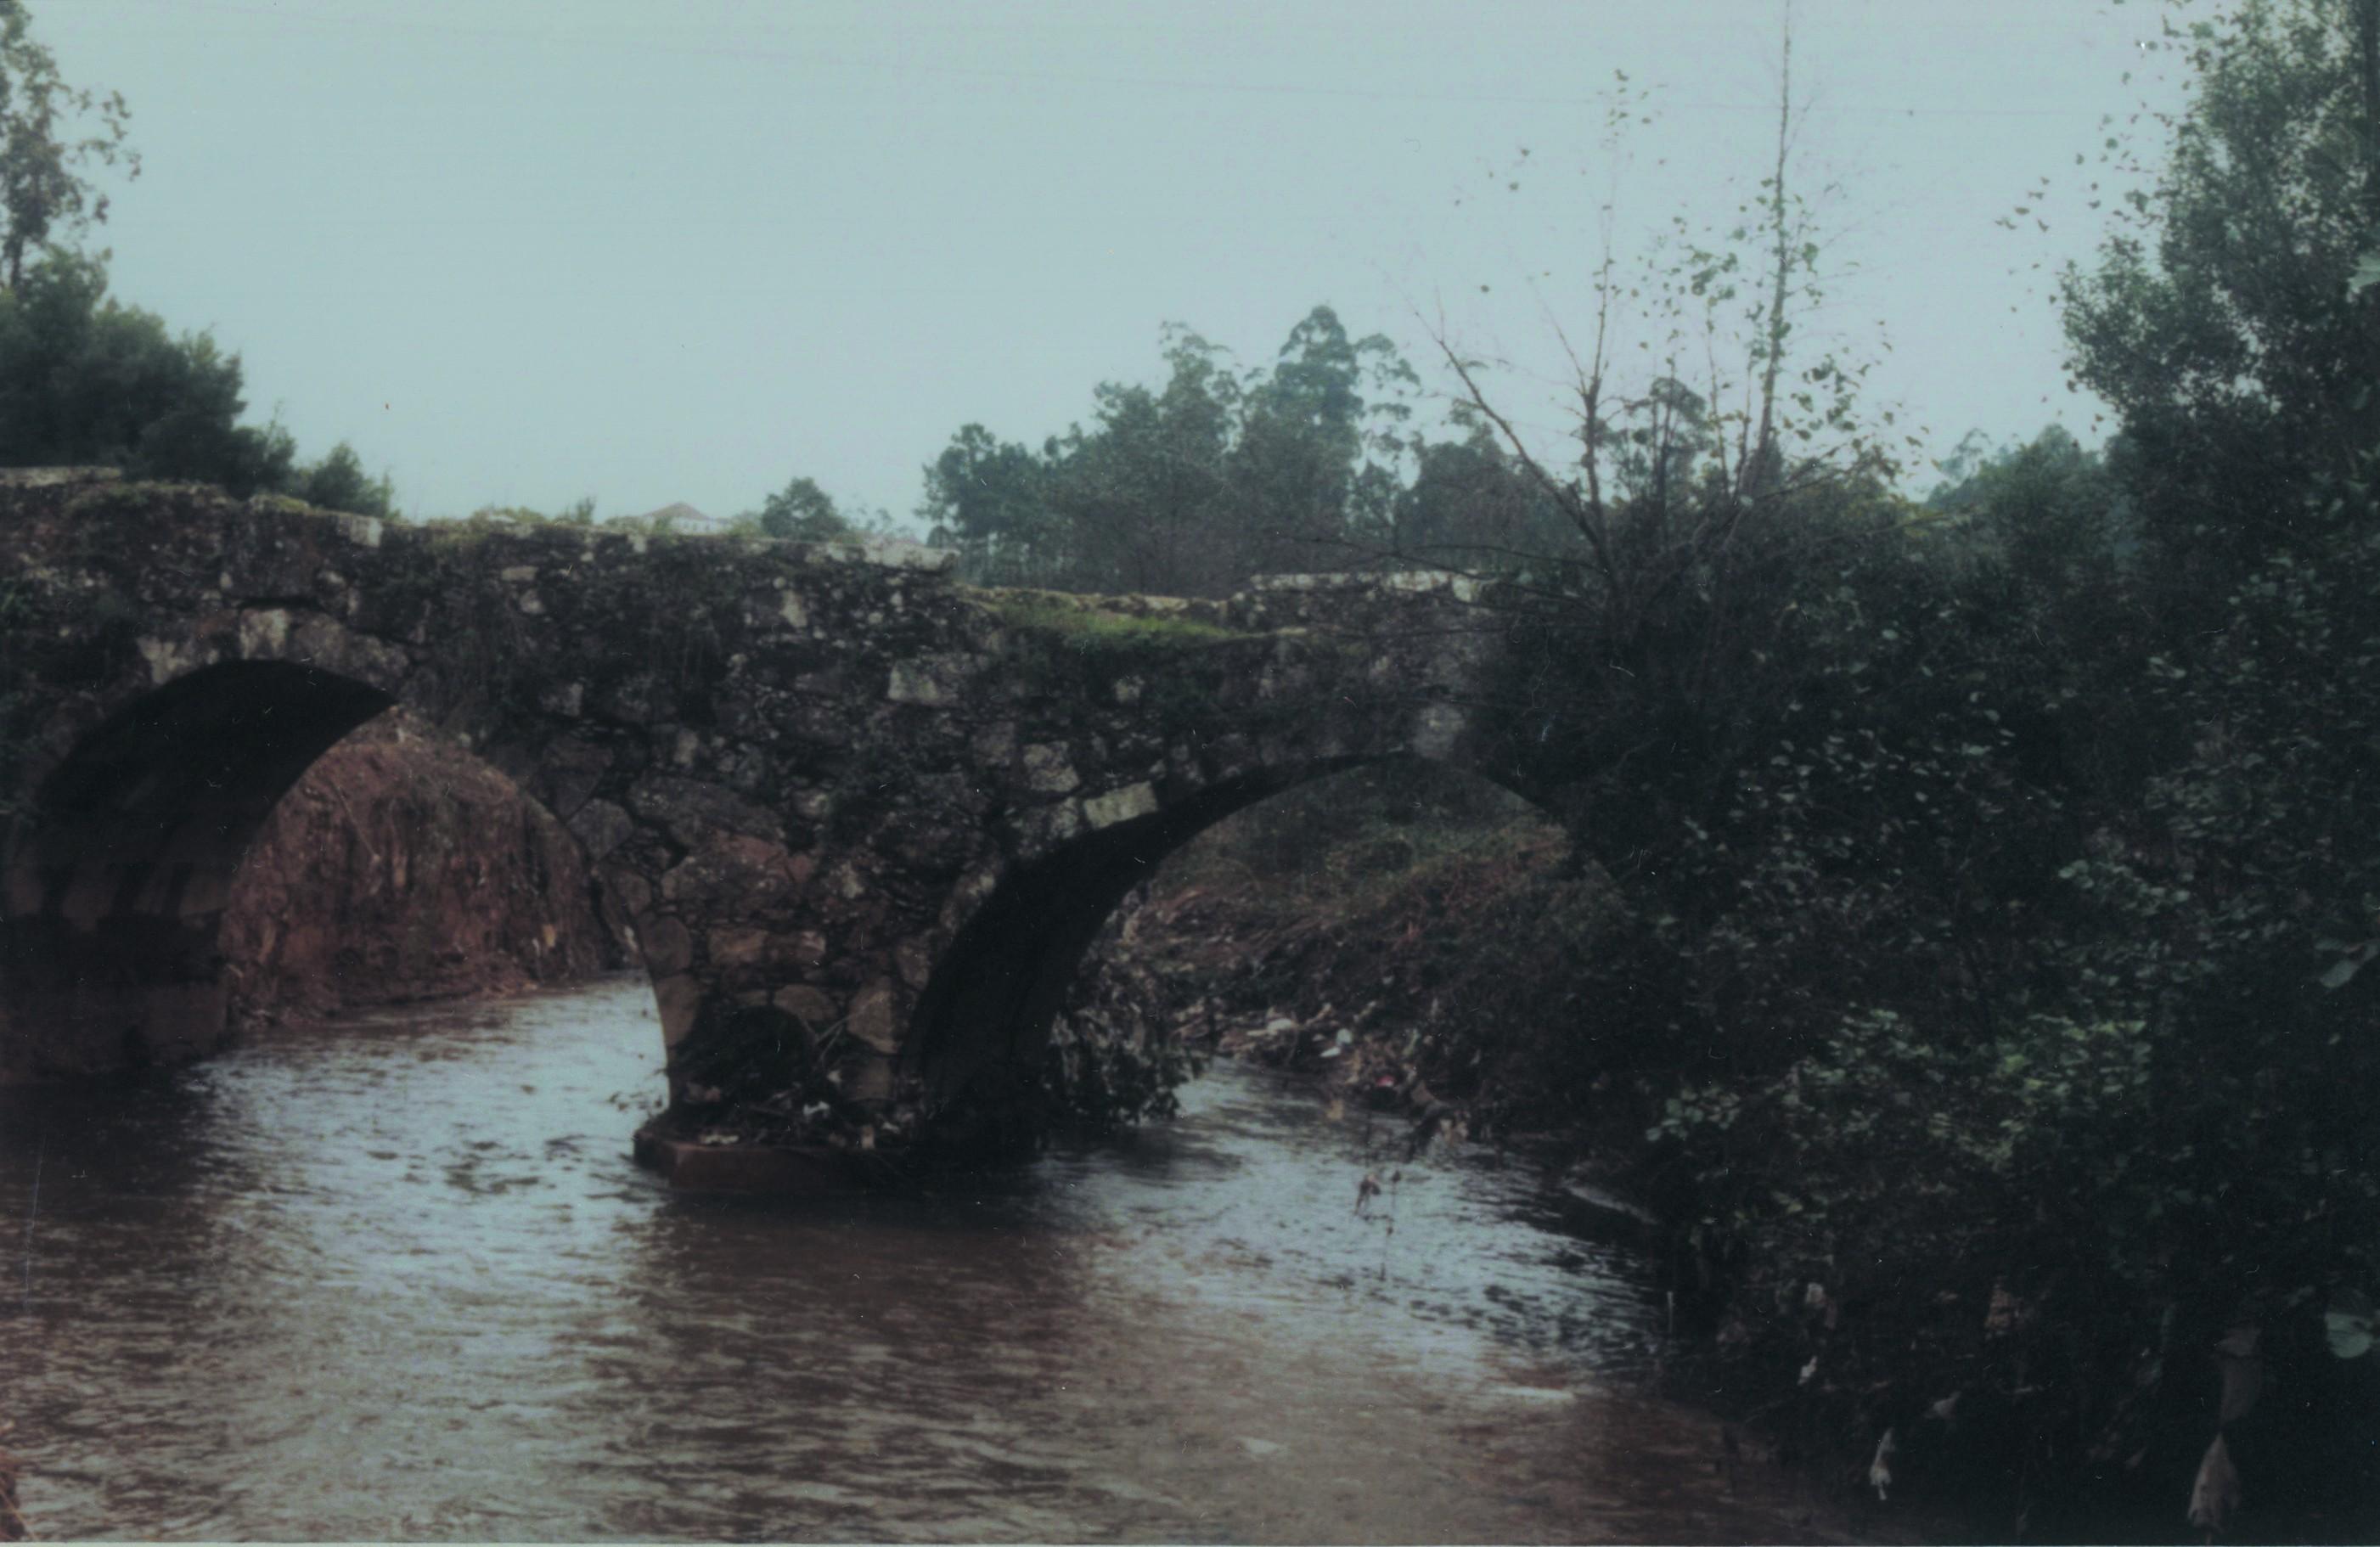 Ponte romana do Salgueiro, Santiago de Riba-Ul (Anos 90)